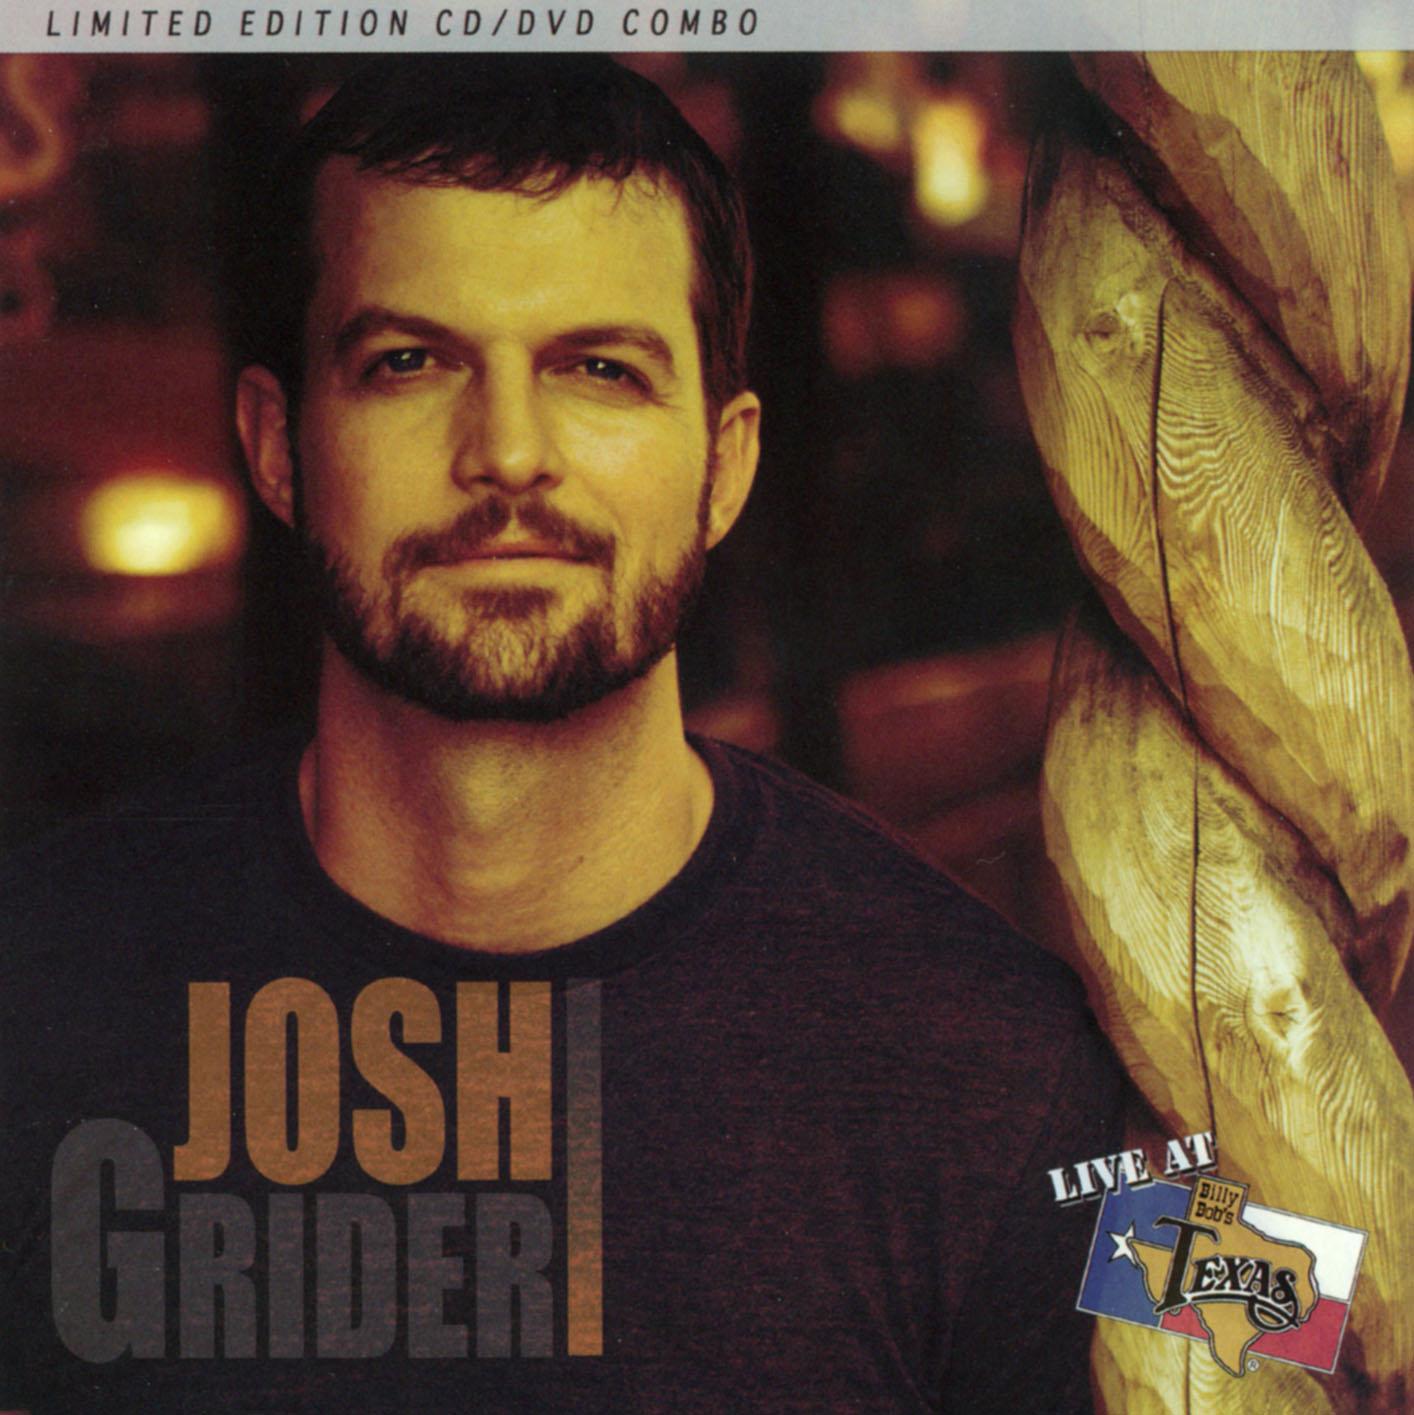 Josh Grider: Live at Billy Bob's Texas